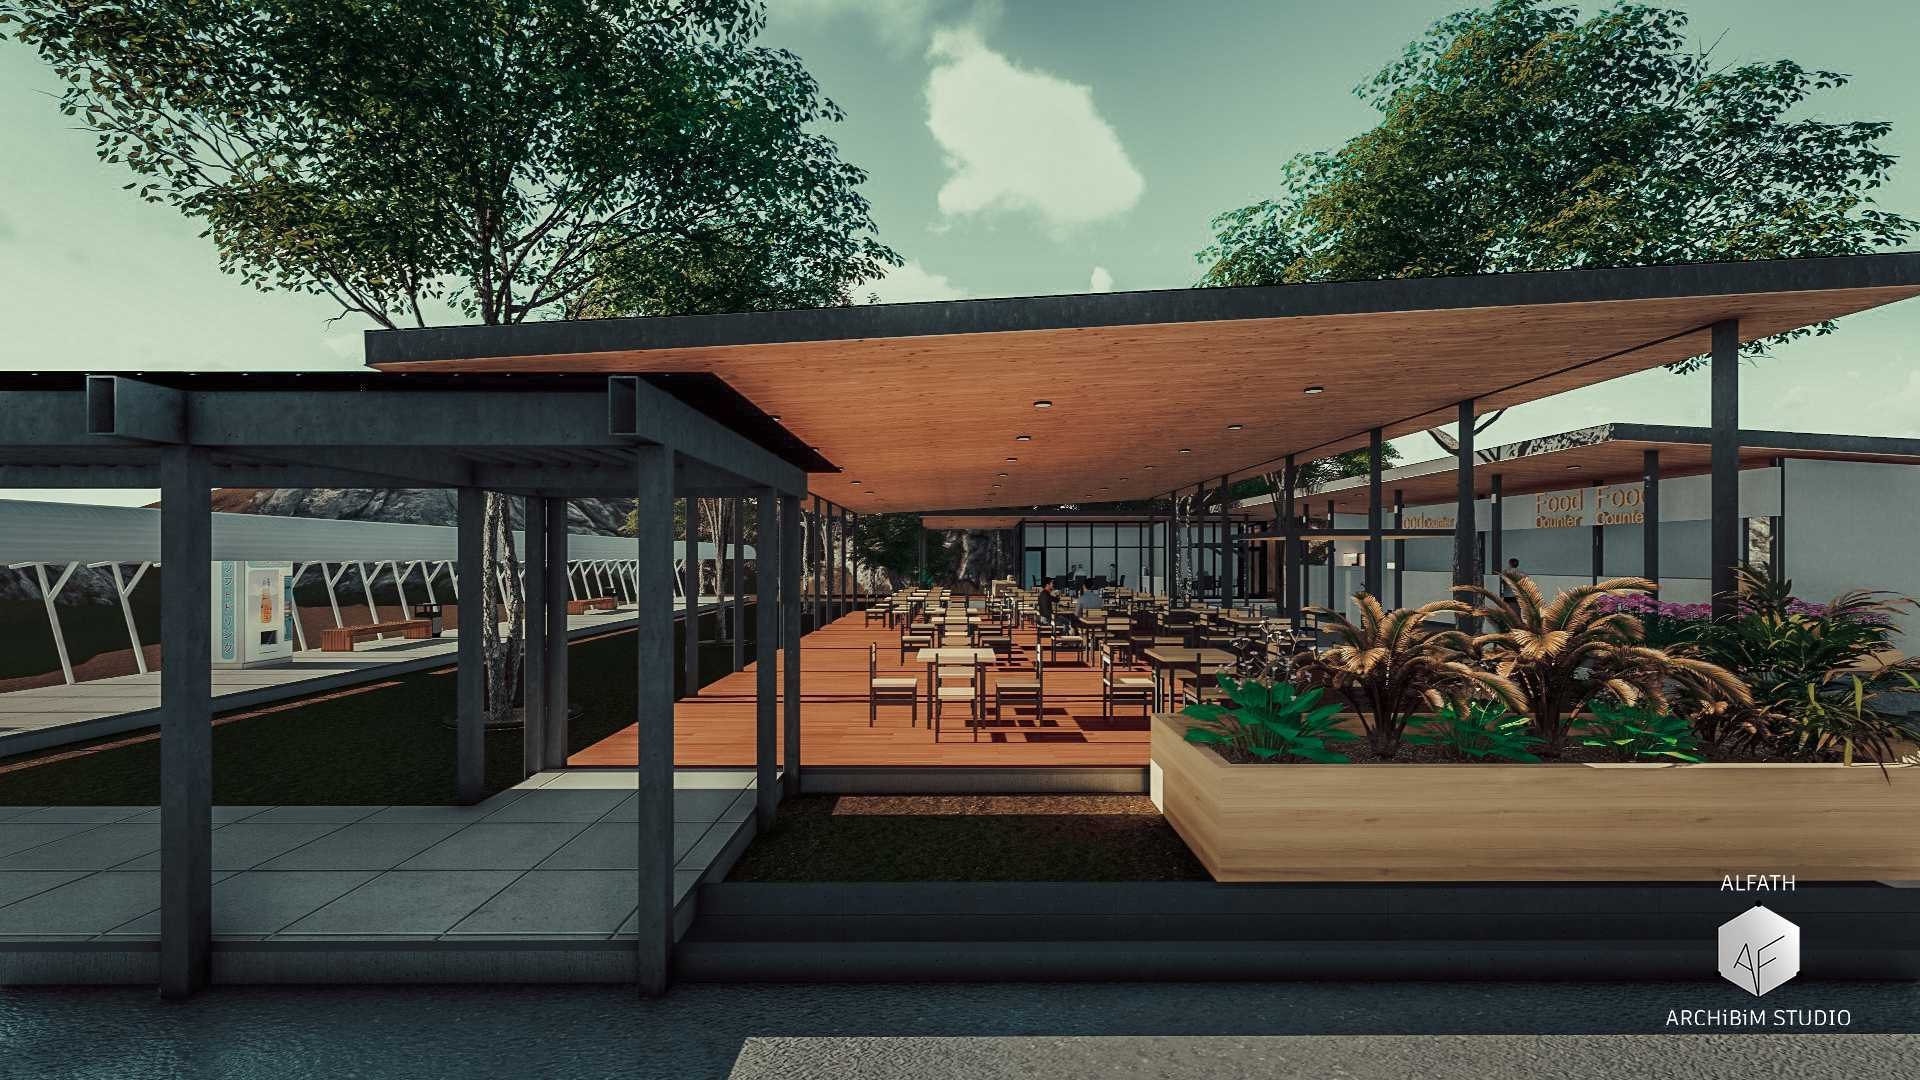 Alfath Archibim Studio Food Court Gmf Aeroasia Tangerang, Banten, Indonesia Tangerang, Banten, Indonesia Alfath-Archibim-Studio-Food-Court-Gmf-Aeroasia Industrial 113620